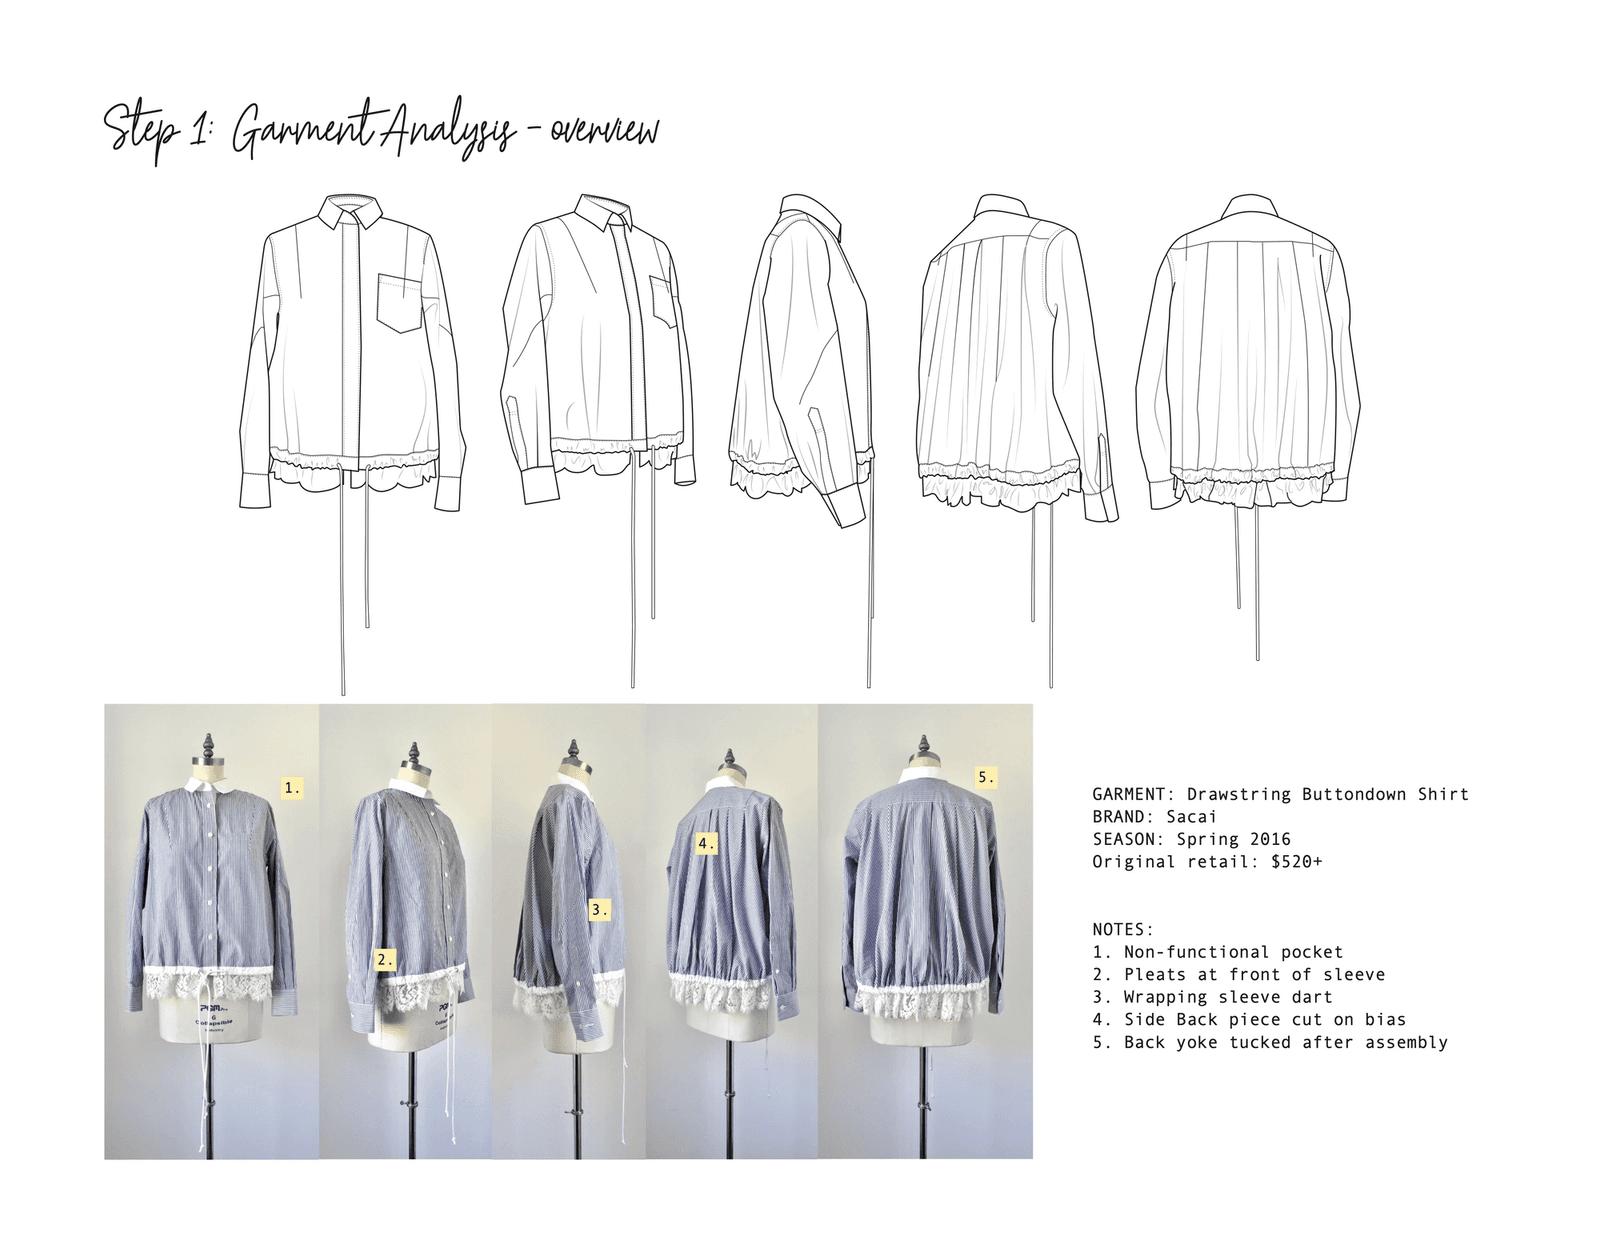 Replication & Pattern Analysis of Sacai Shirt